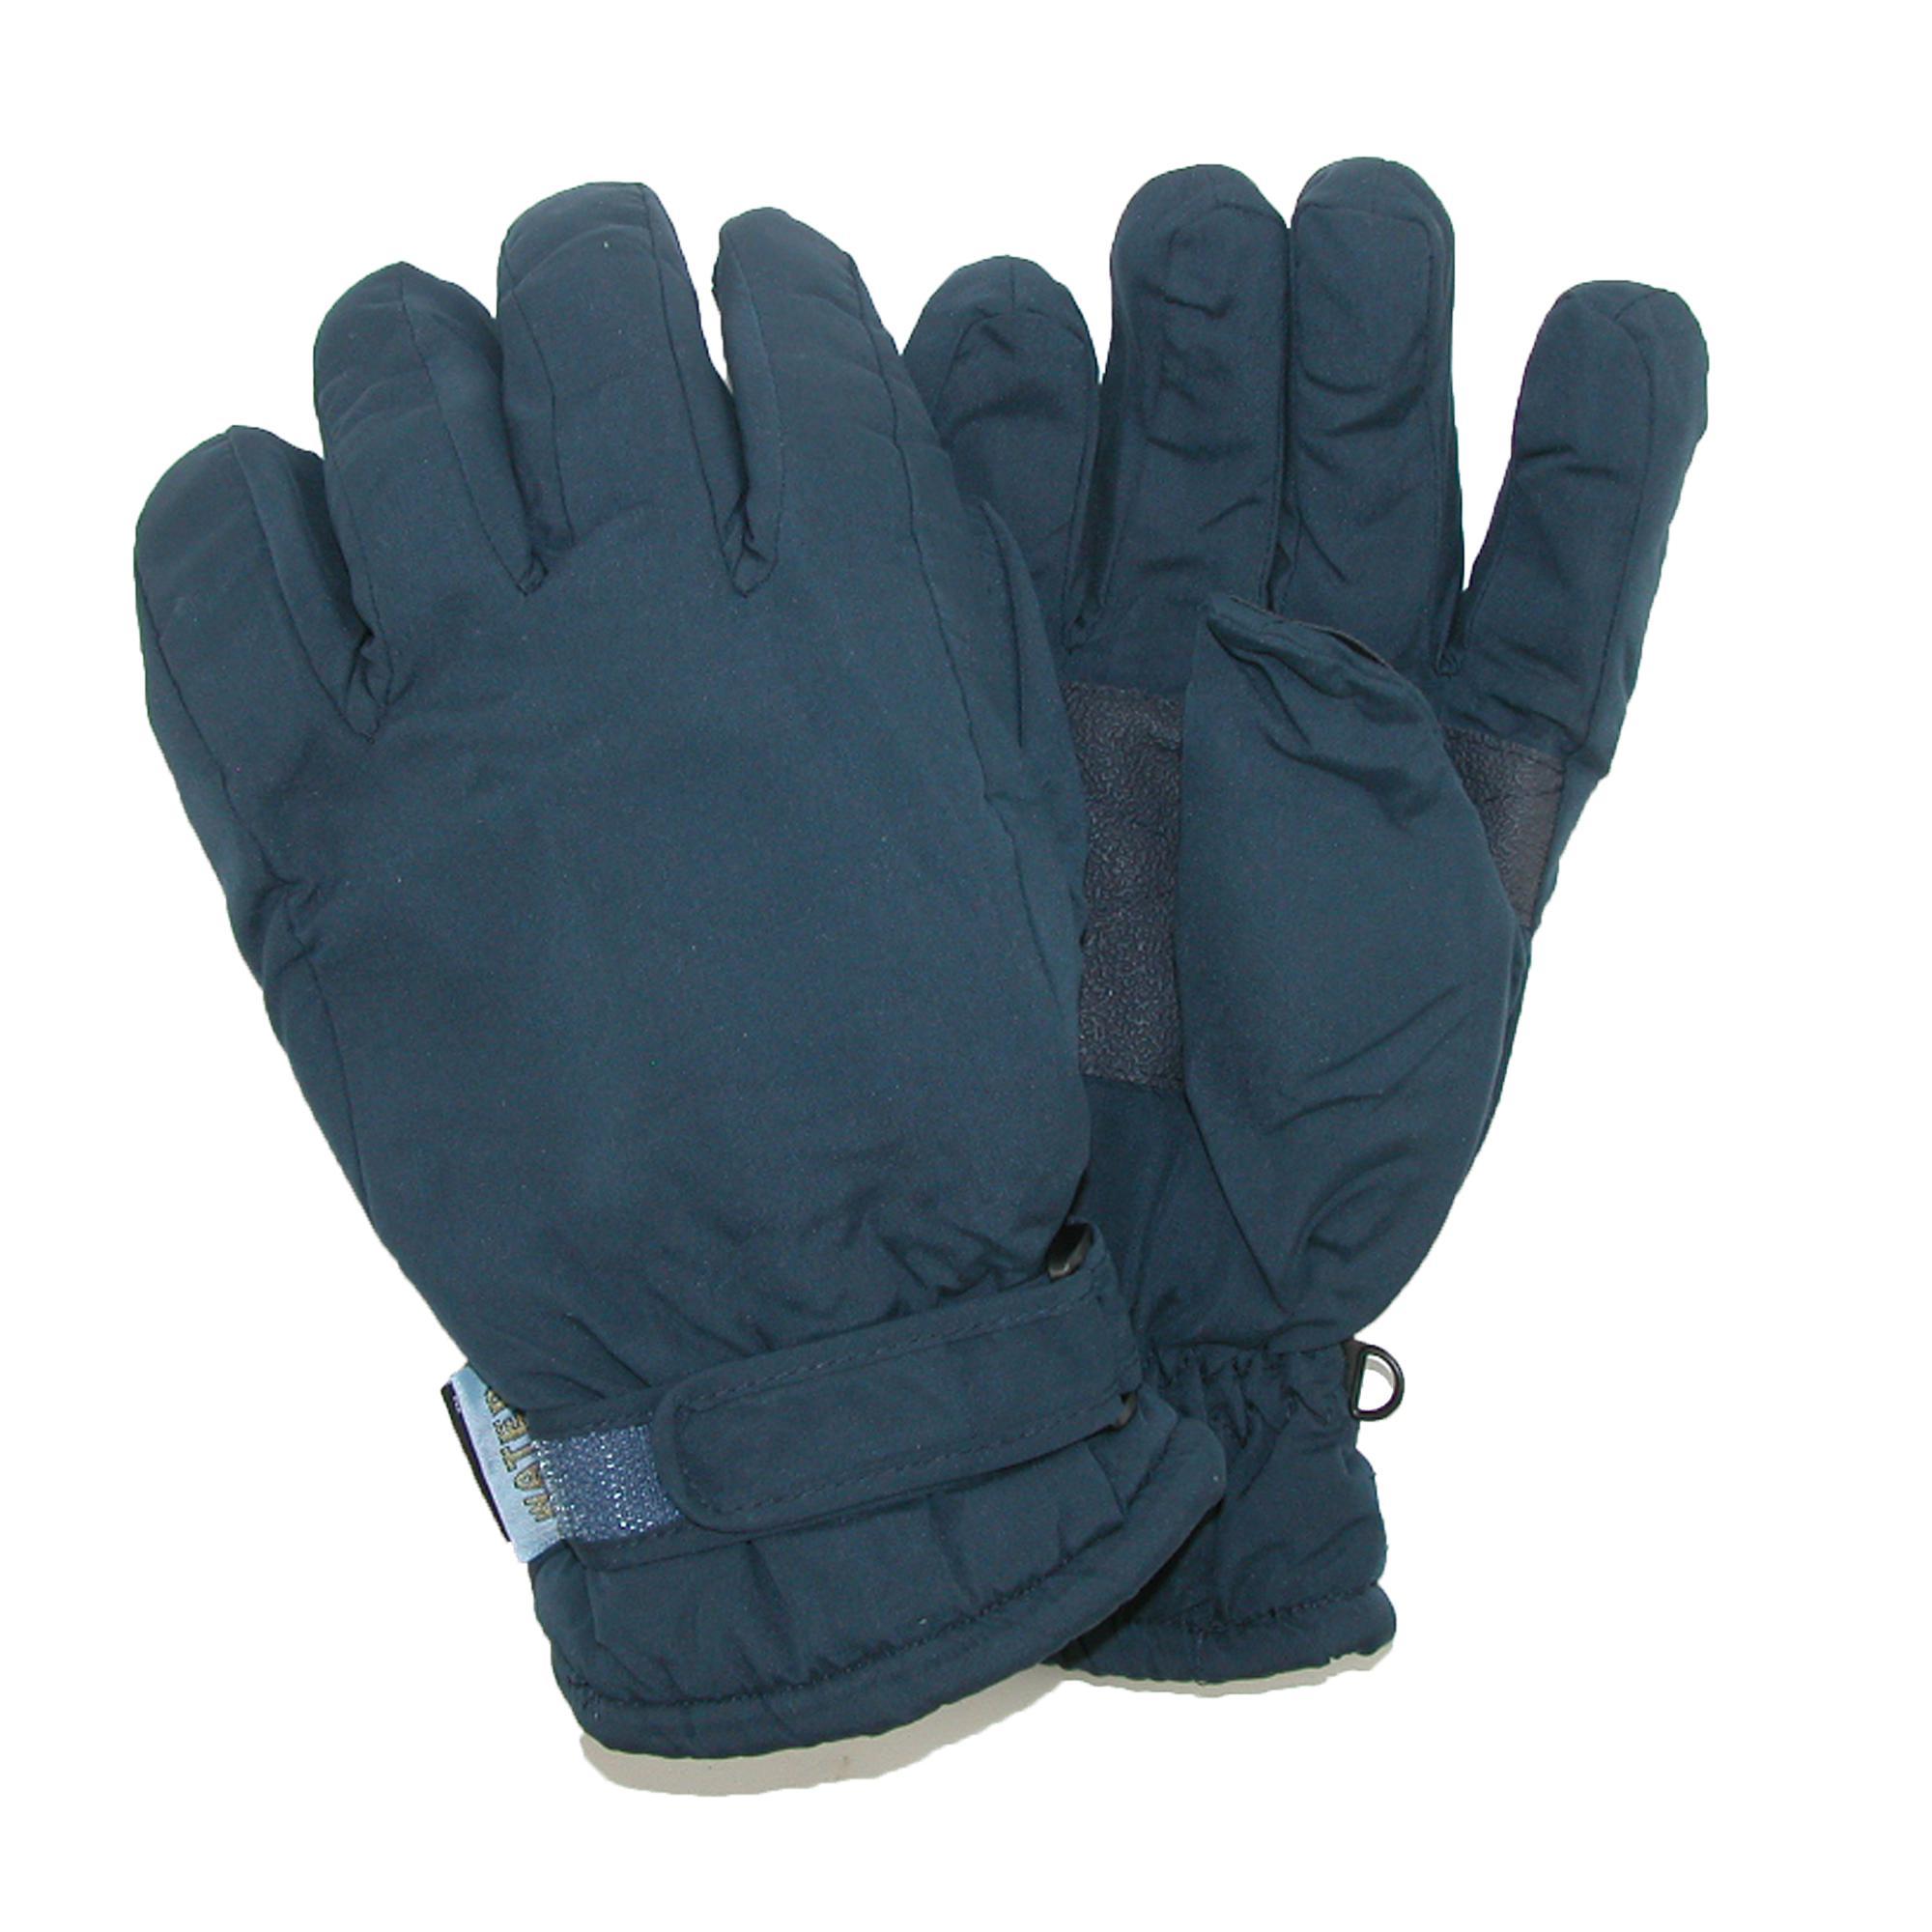 CTM Men's Waterproof Thinsulate and Fleece Lined Ski Gloves